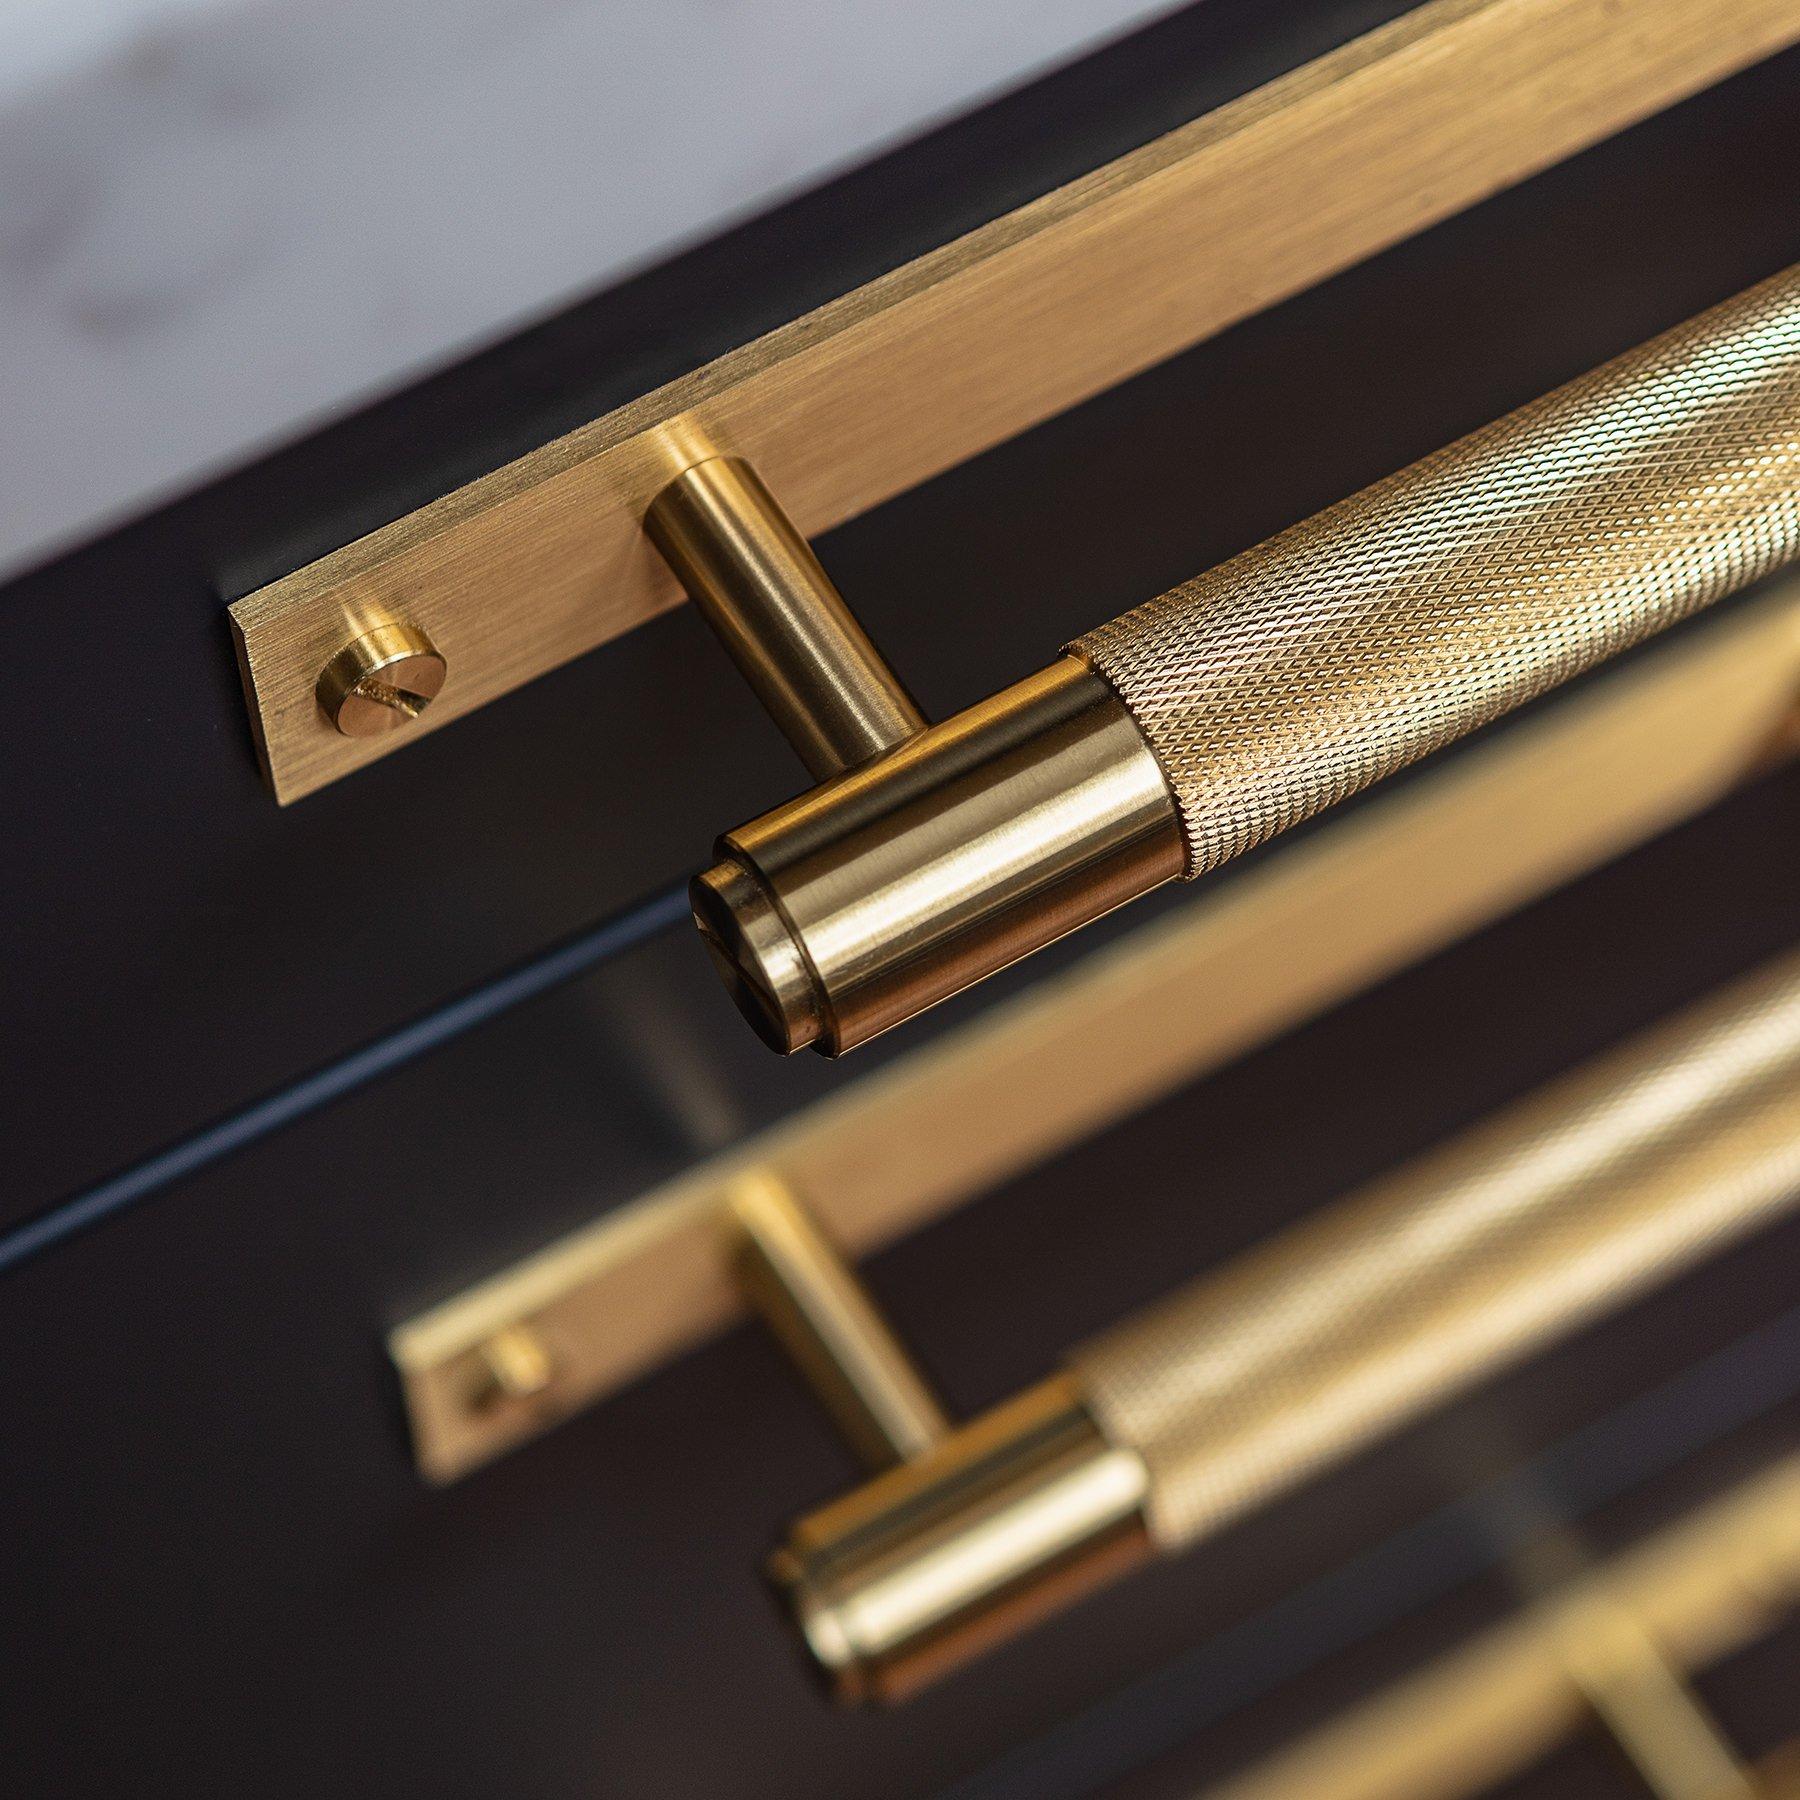 buster_punch_pull_bar_plate_brass_close_up-1-1.jpg